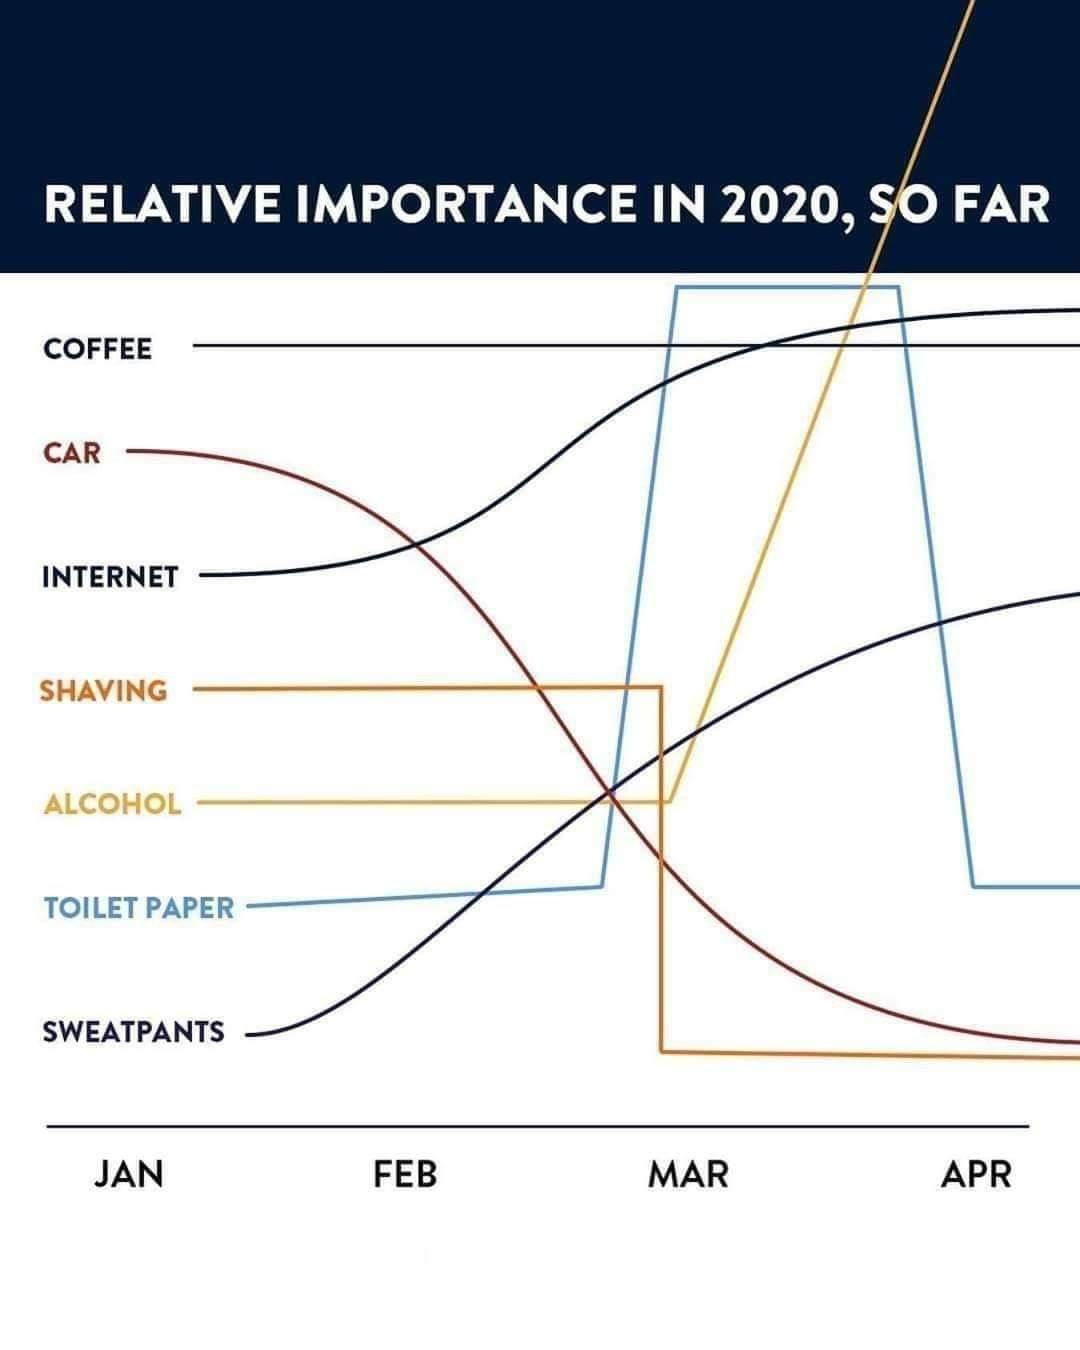 Relative importance graph